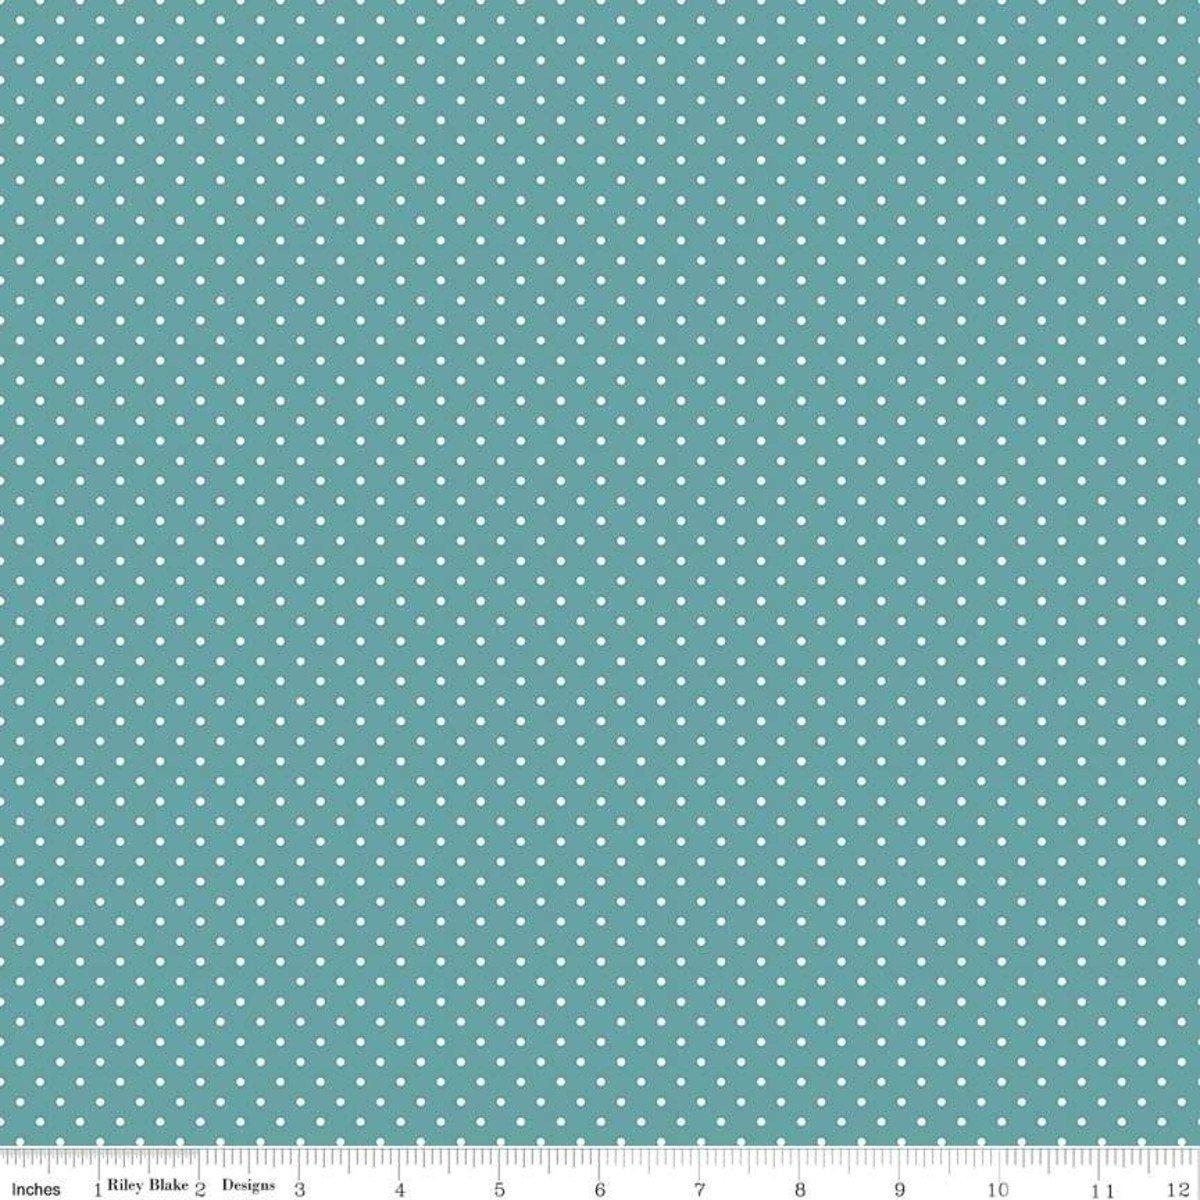 Riley Blake Designs, Swiss Dot - Swiss Dot Teal